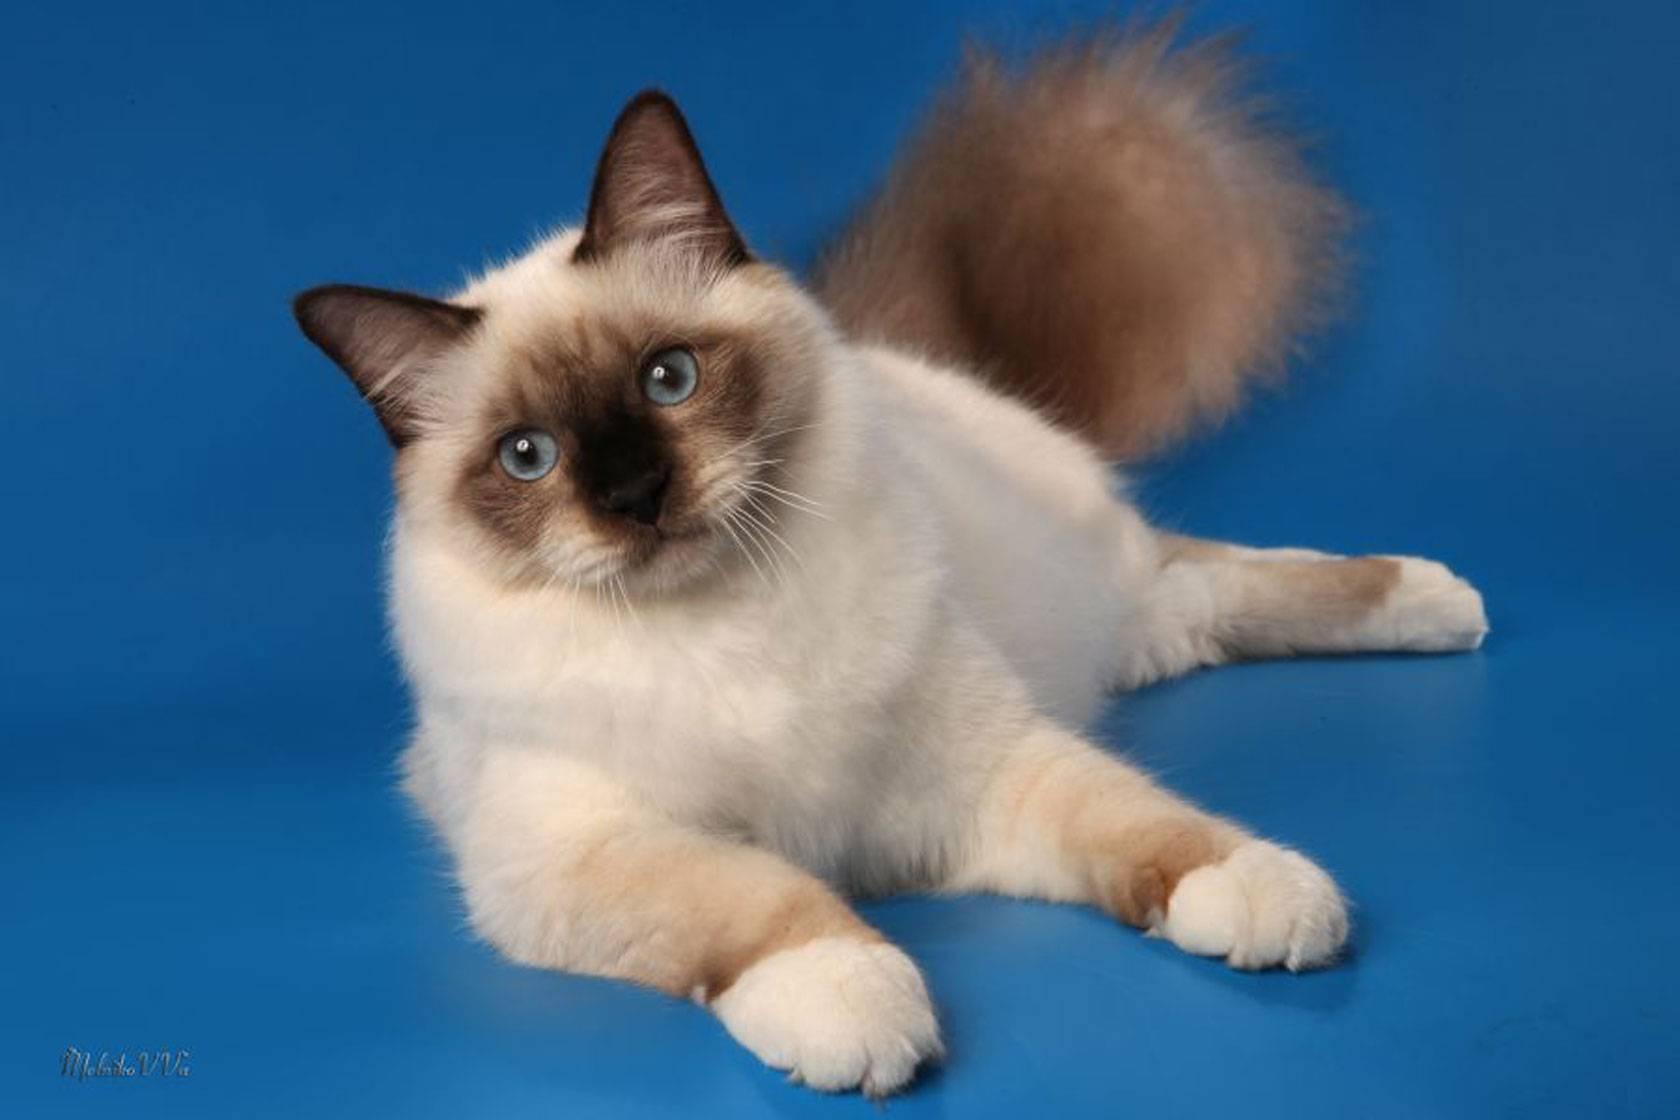 Сиамская кошка: фото, описание породы, характер, уход, видео сиамская кошка: фото, описание породы, характер, уход, видео